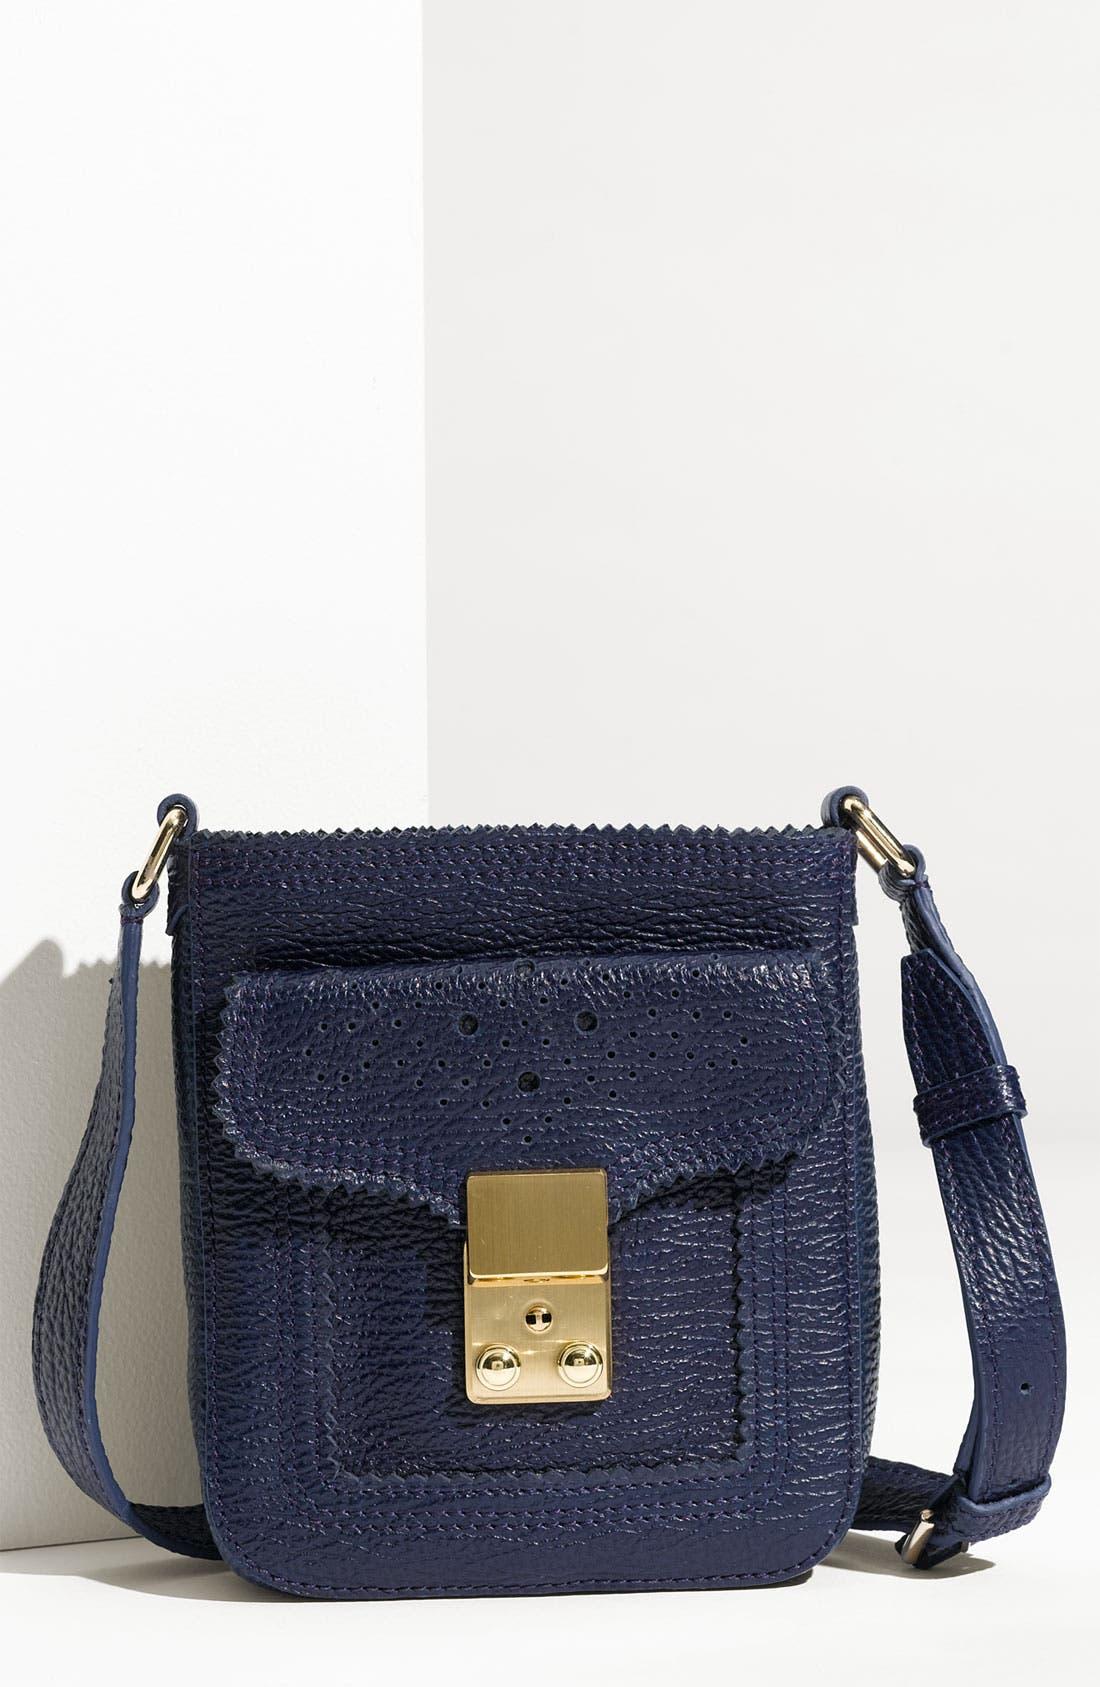 Alternate Image 1 Selected - 3.1 Phillip Lim 'Pashli Camera' Textured Calfskin Crossbody Bag